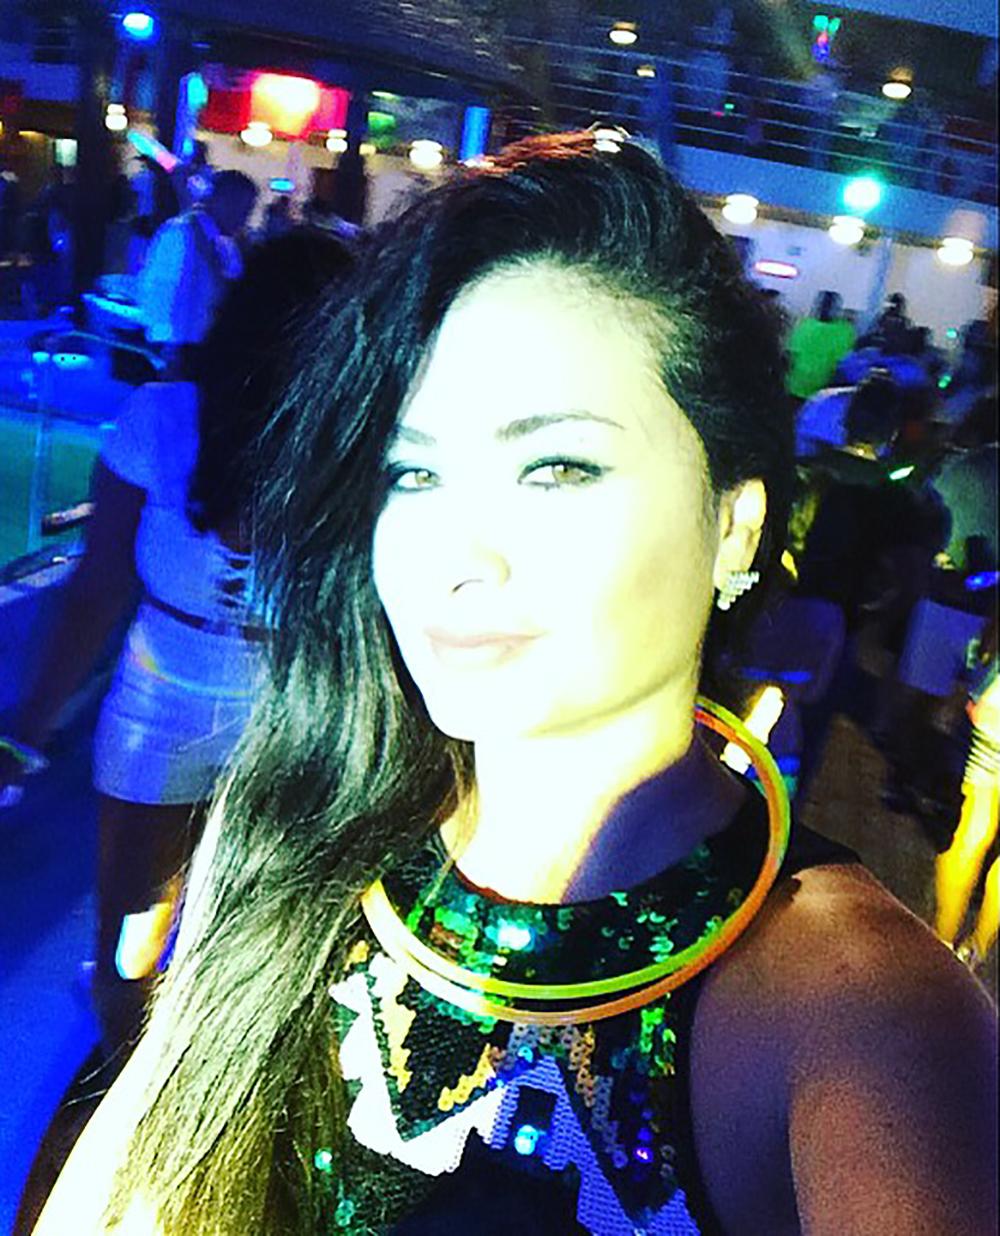 alegria-onboard-aventura-dance-cruise-03